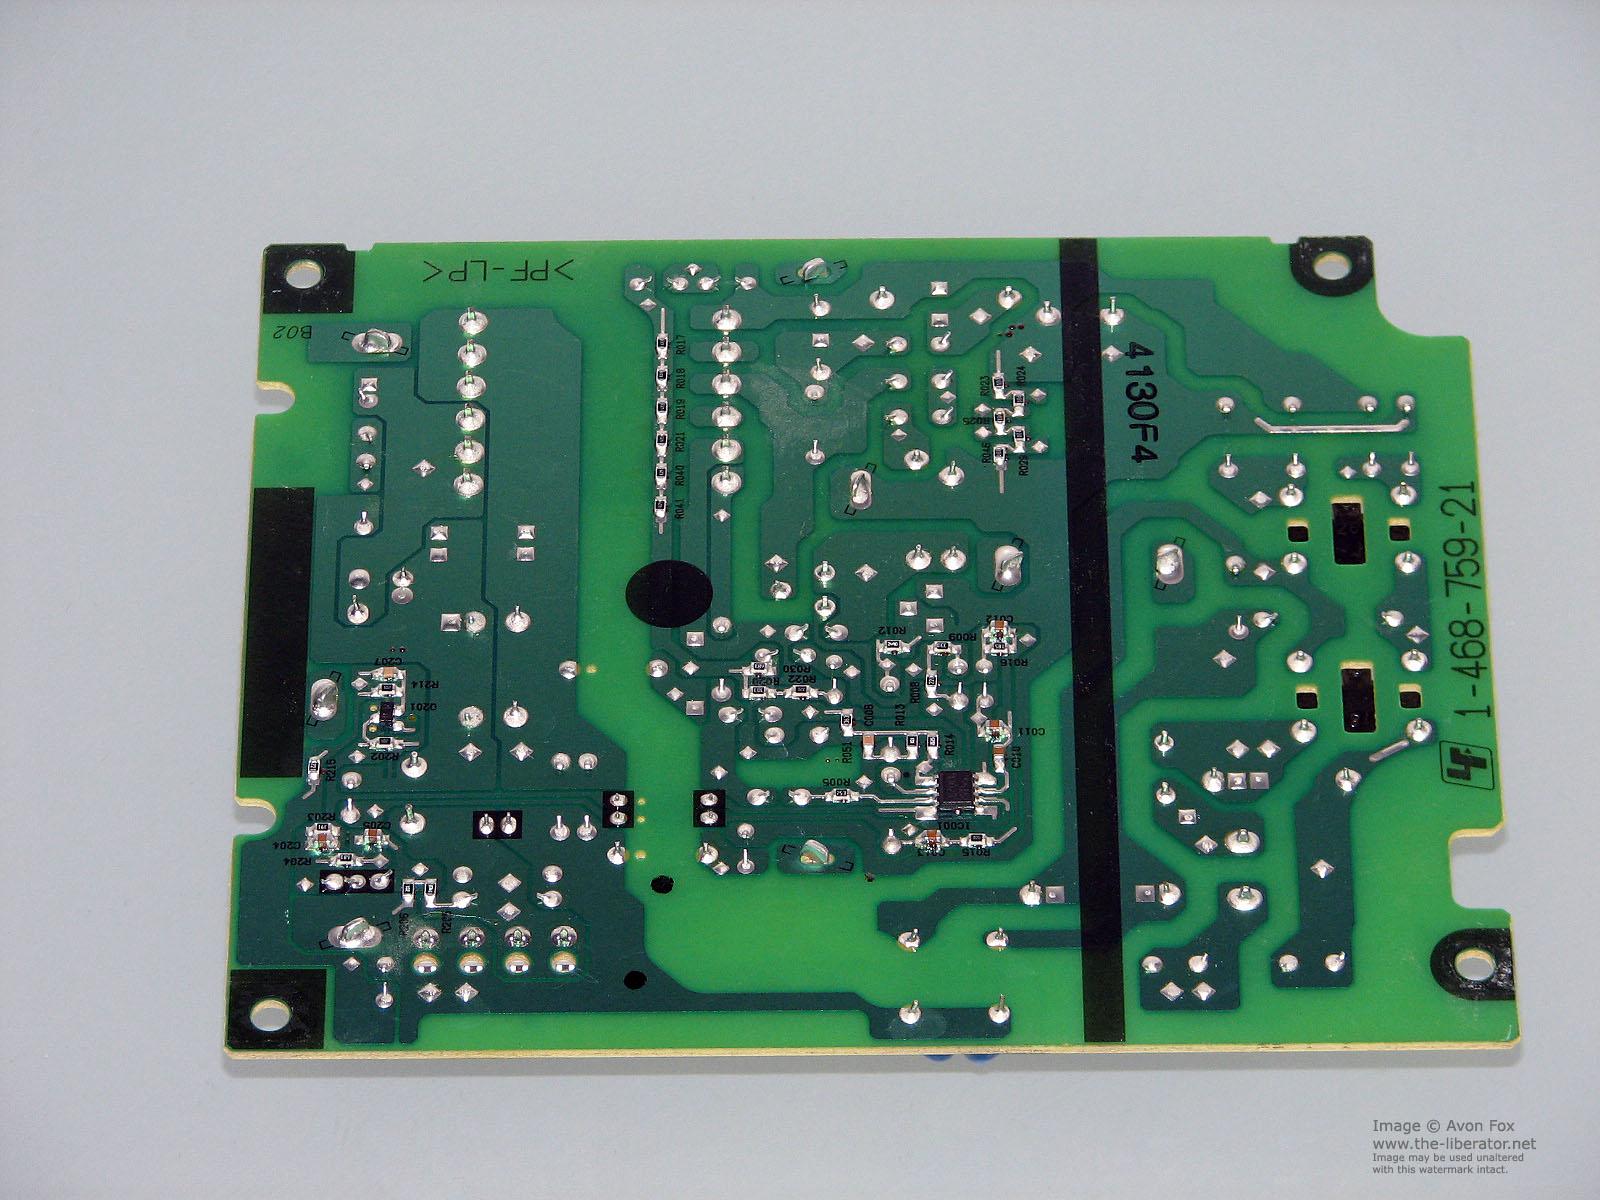 Jamma Board Diagram Free Download Wiring Schematic Electric Circuit Games Ps2 Power Schematics